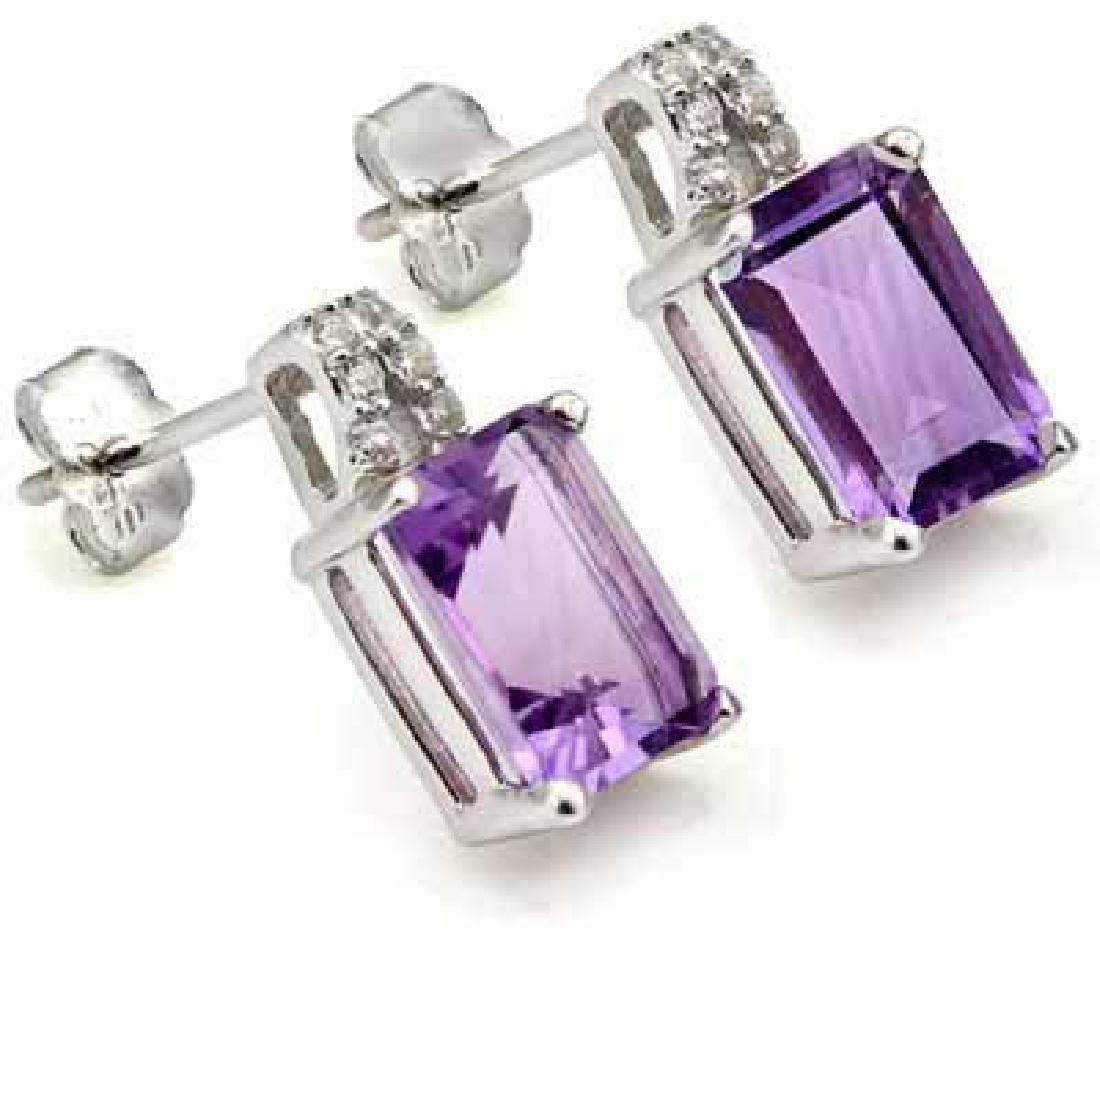 3 1/3 CARAT AMETHYST & (12 PCS) CREATED DIAMOND 925 STE